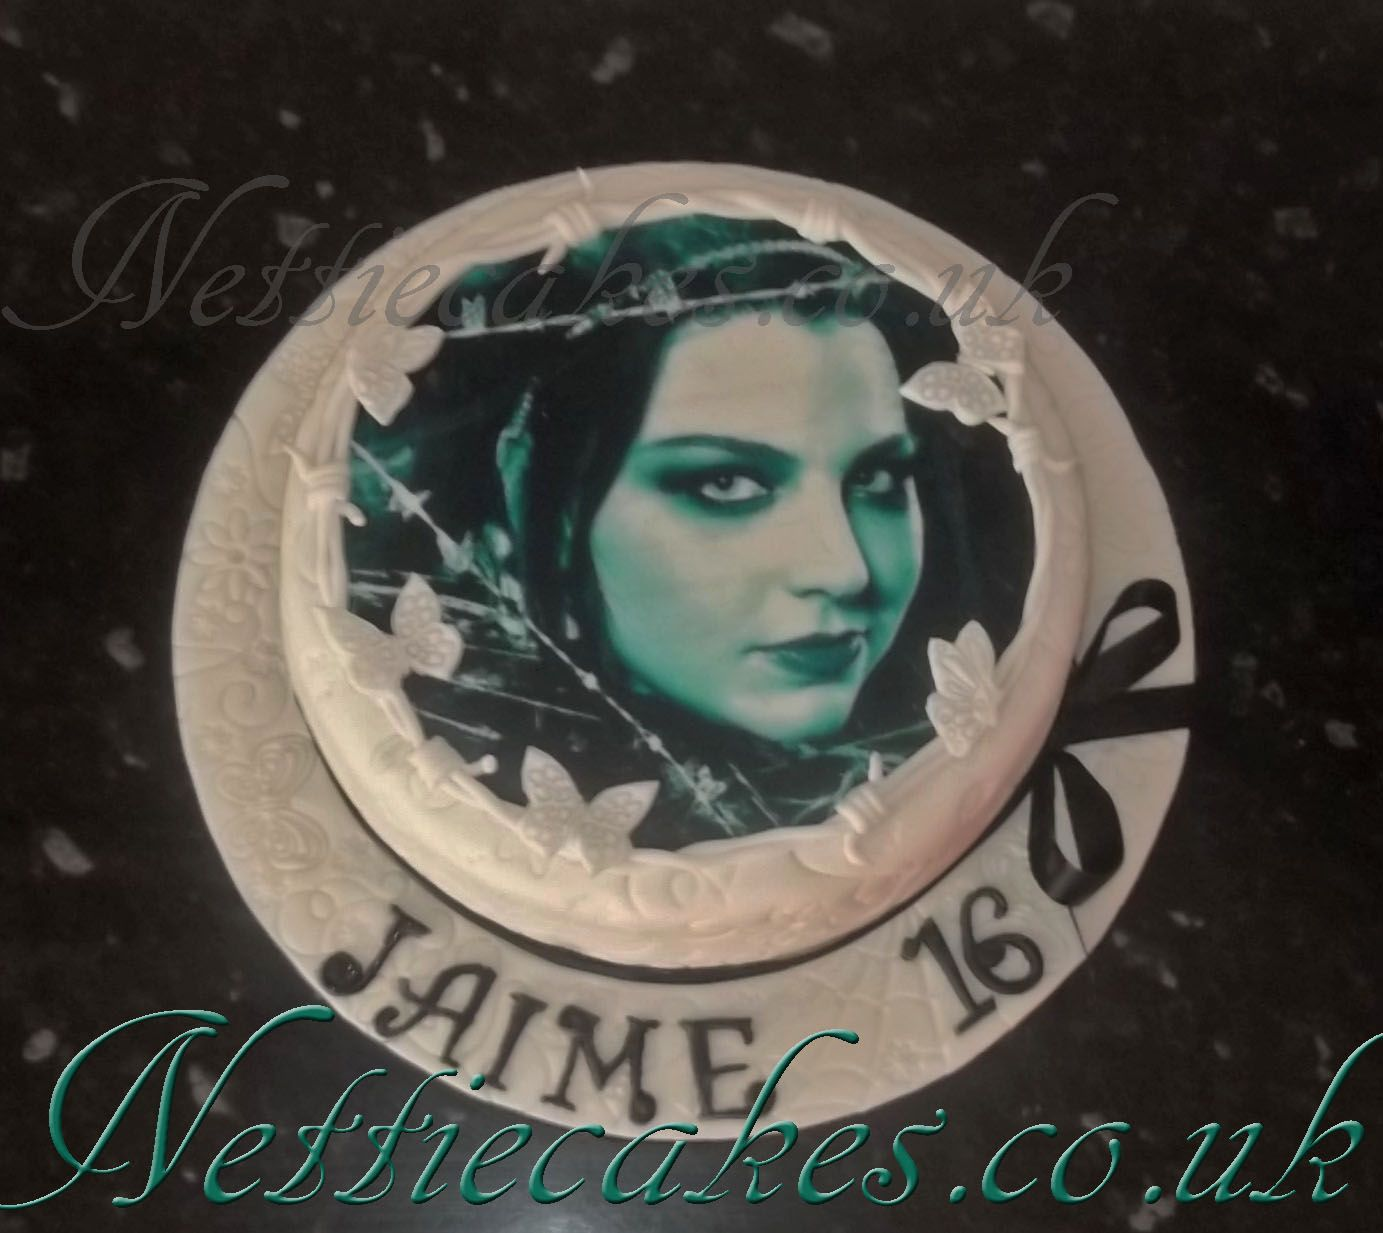 Amy Lee Evanescence Cake Cakes Pinterest Amy Lee Evanescence